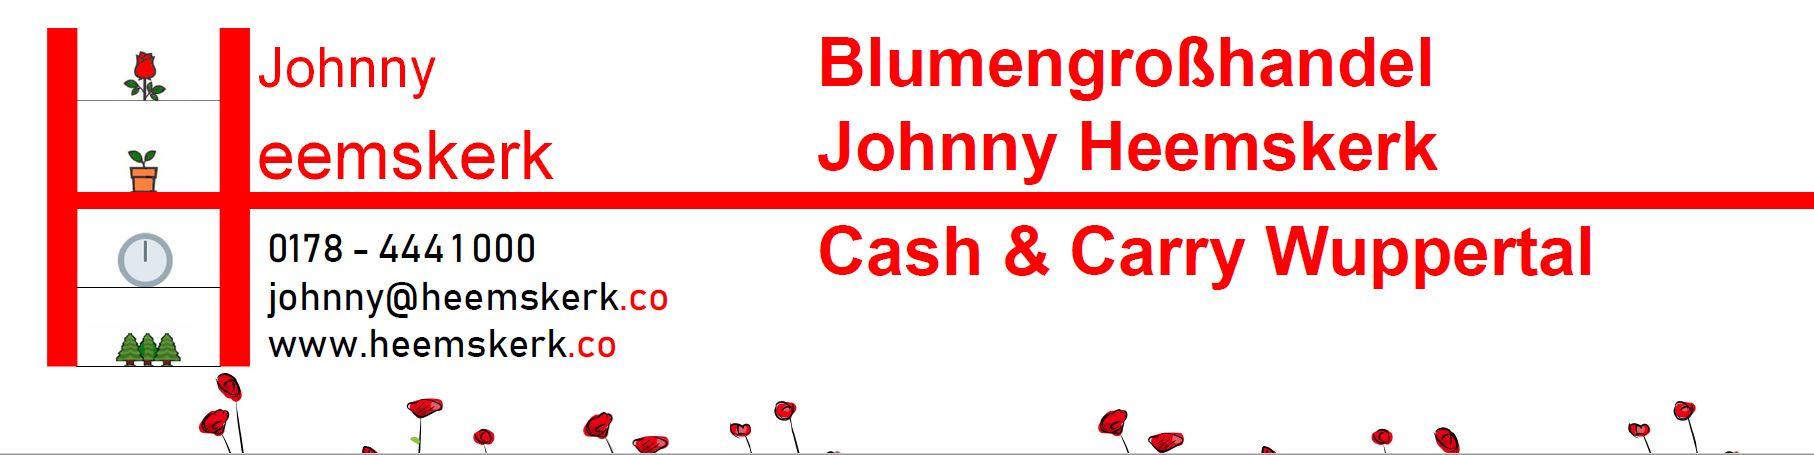 Blumengroßhandel Johnny Heemskerk, Hattingen